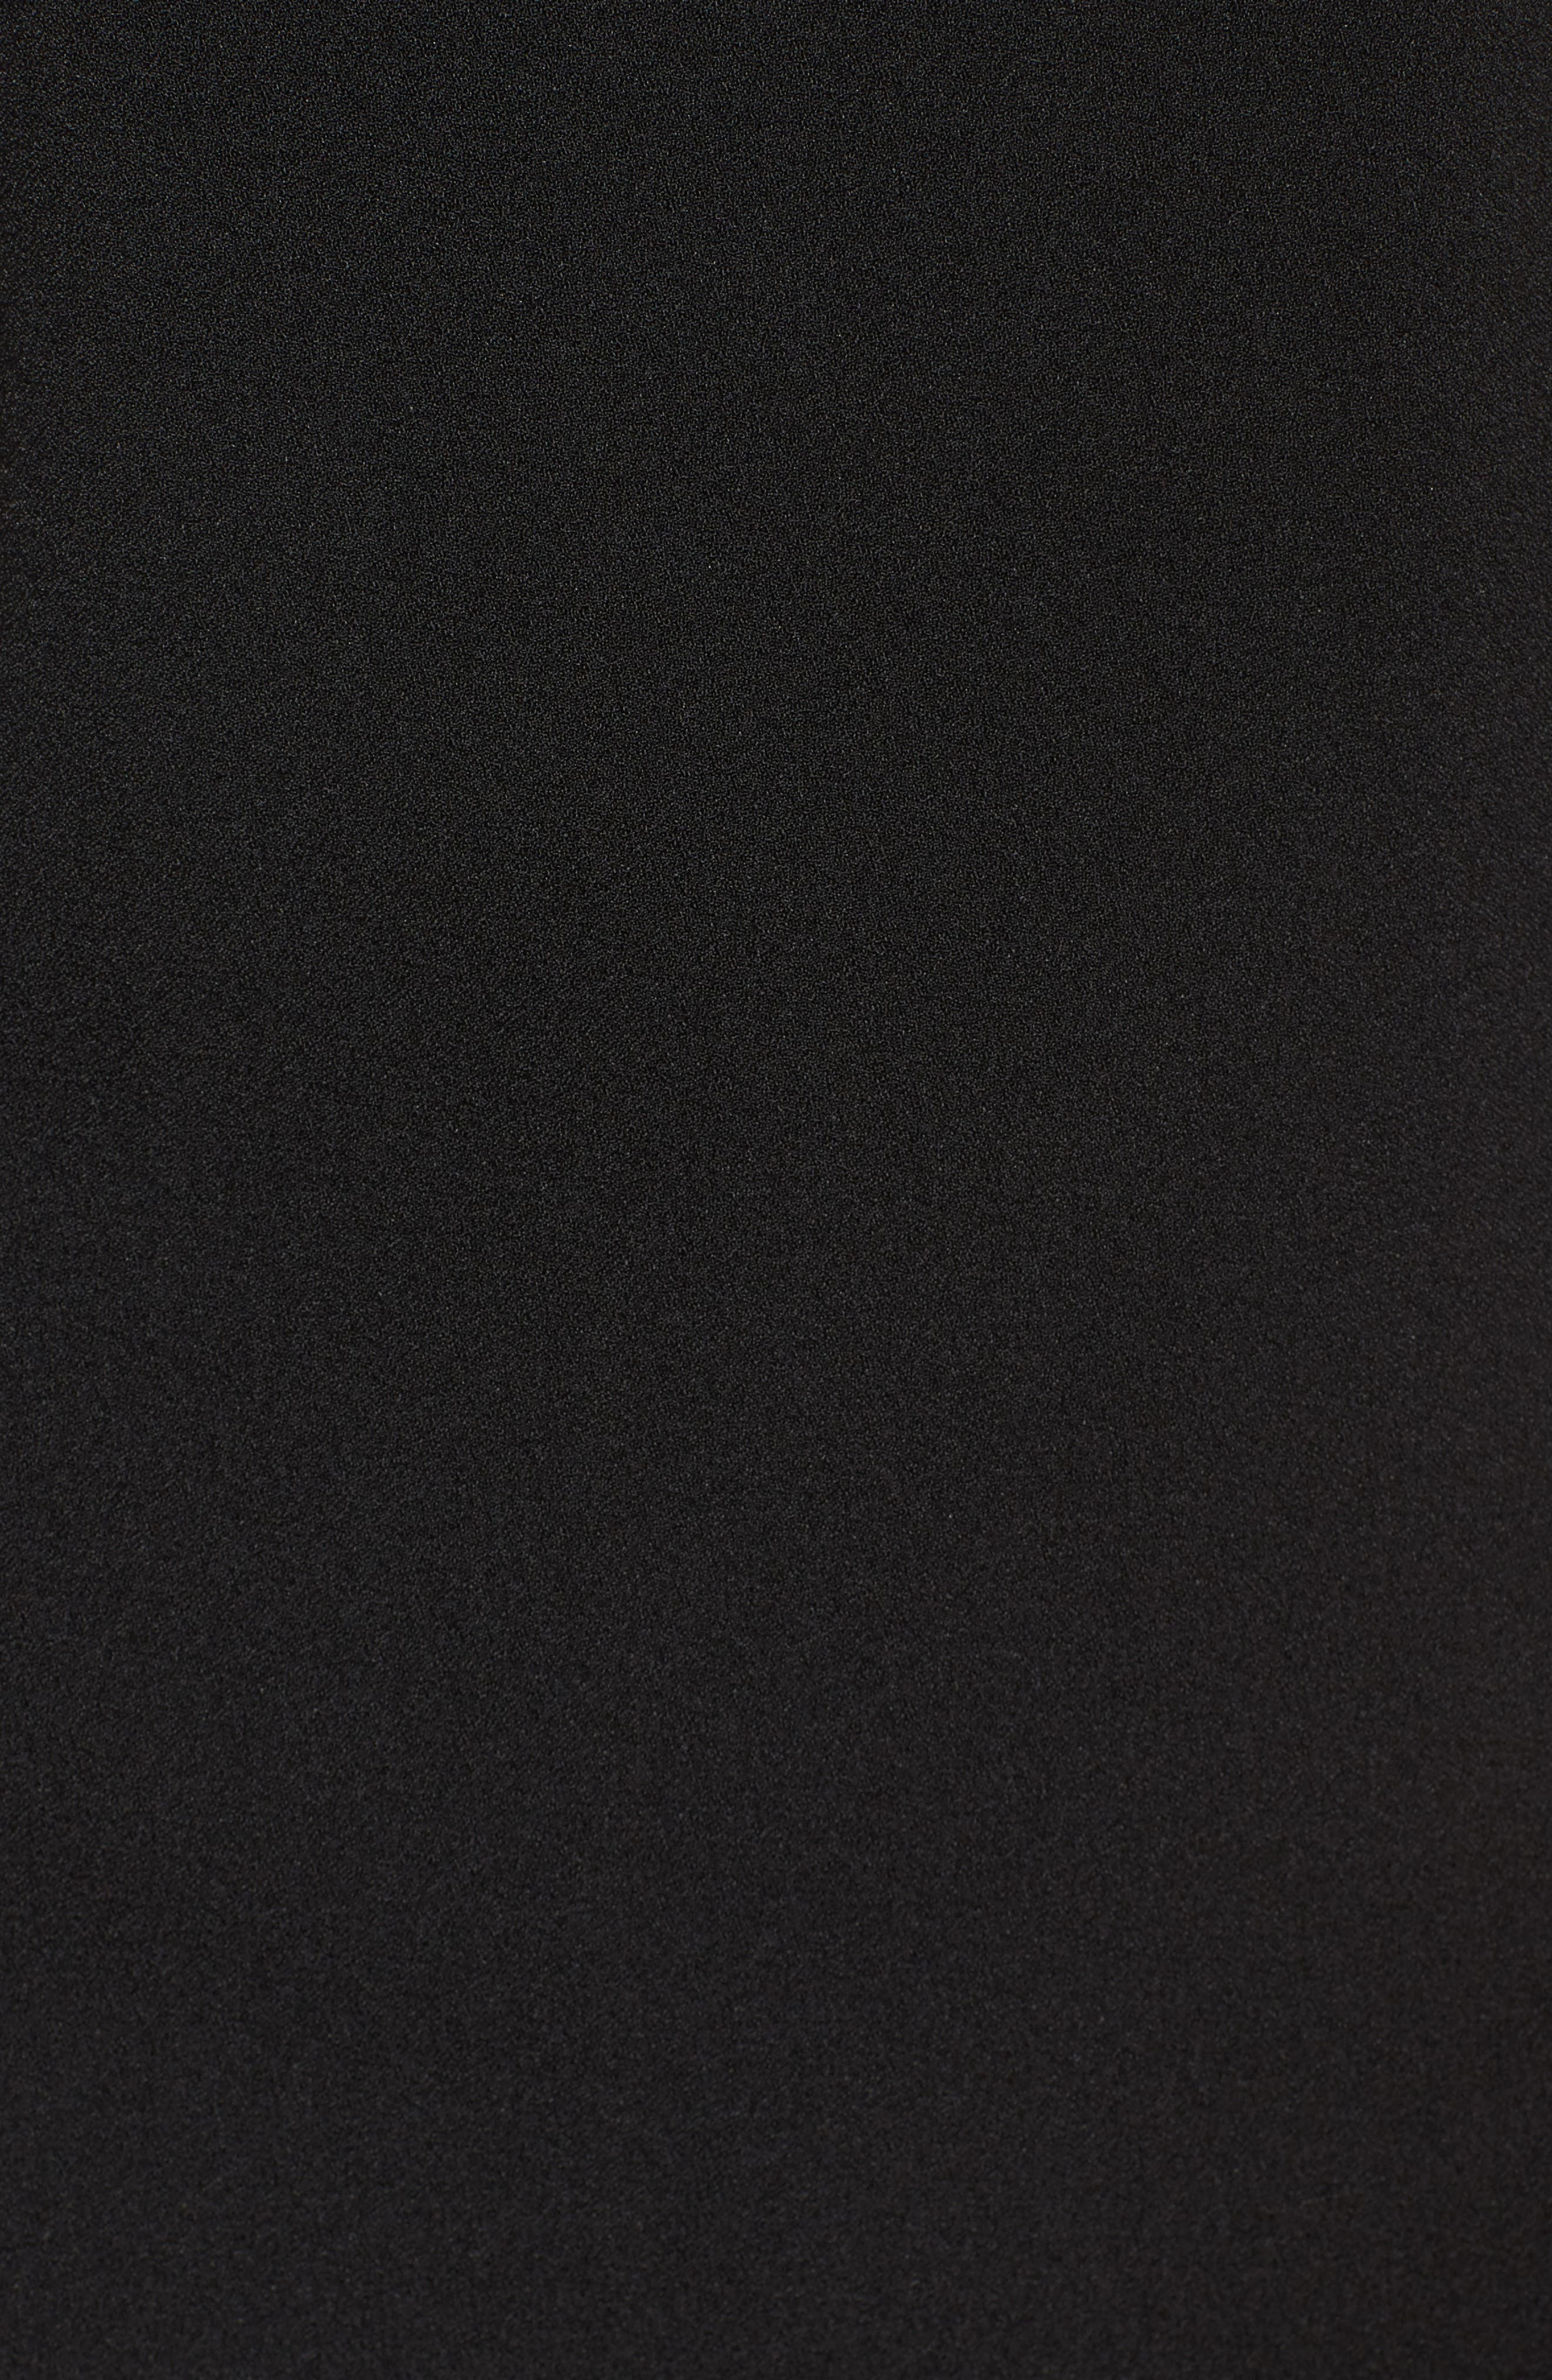 Lace Ruffle Sheath Dress,                             Alternate thumbnail 5, color,